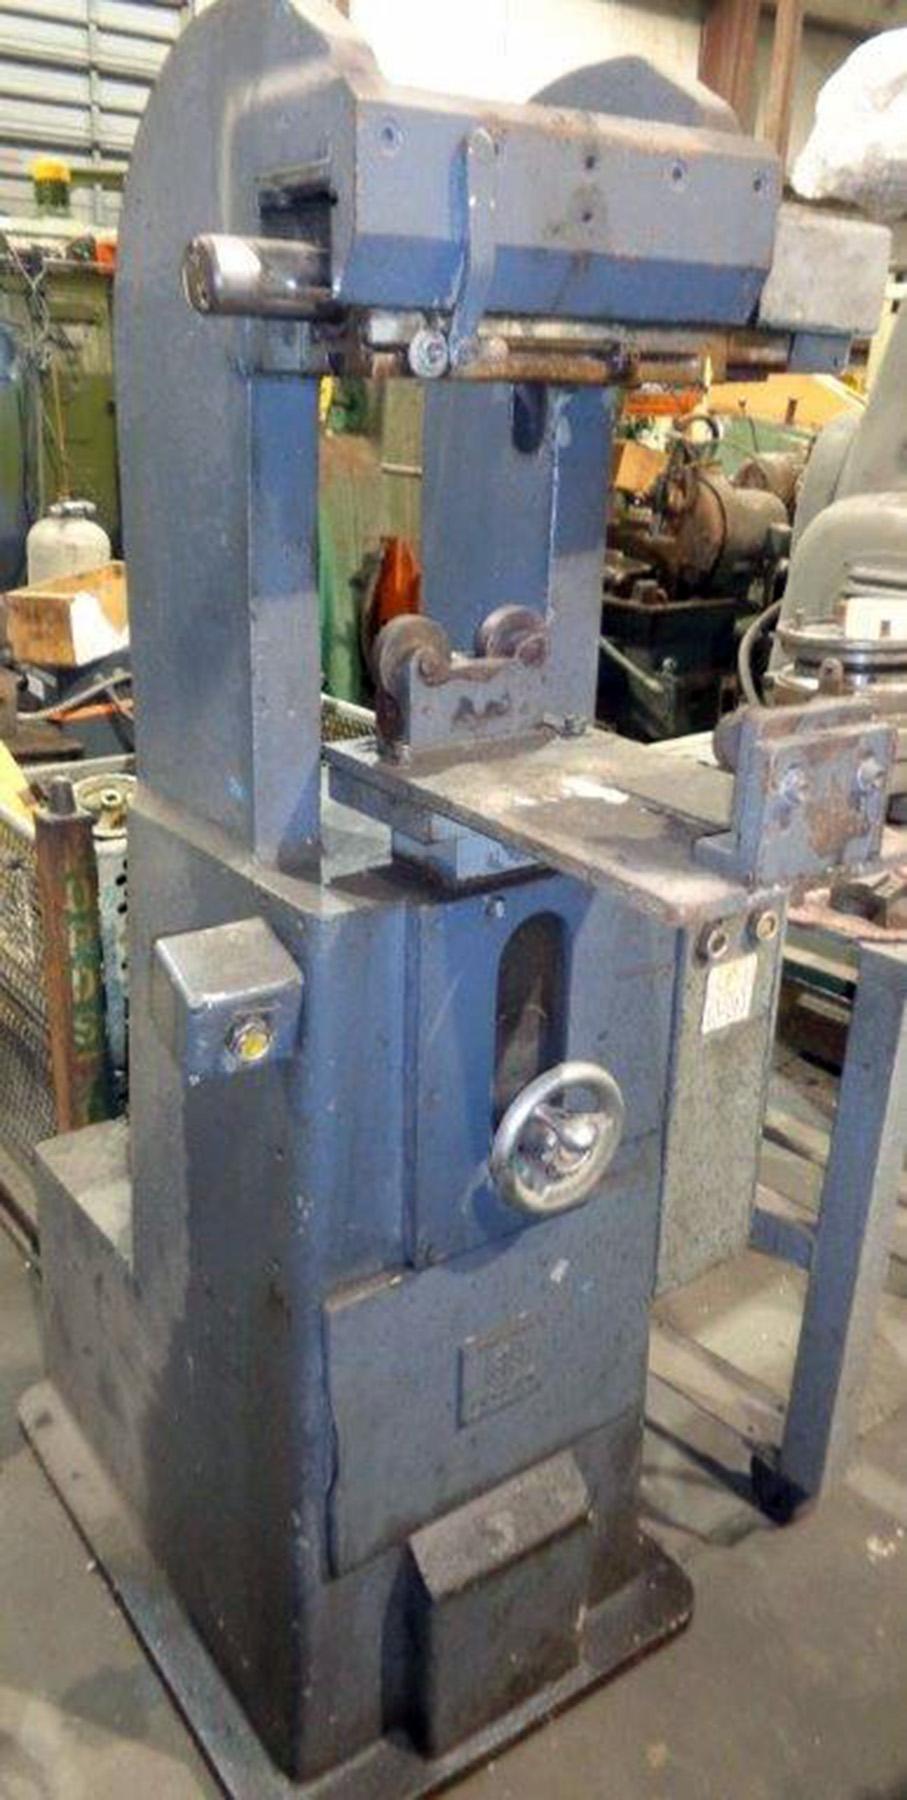 USED, SCHMIDT MODEL 175-5 HYDRAULIC ROLL MARKING MACHINE